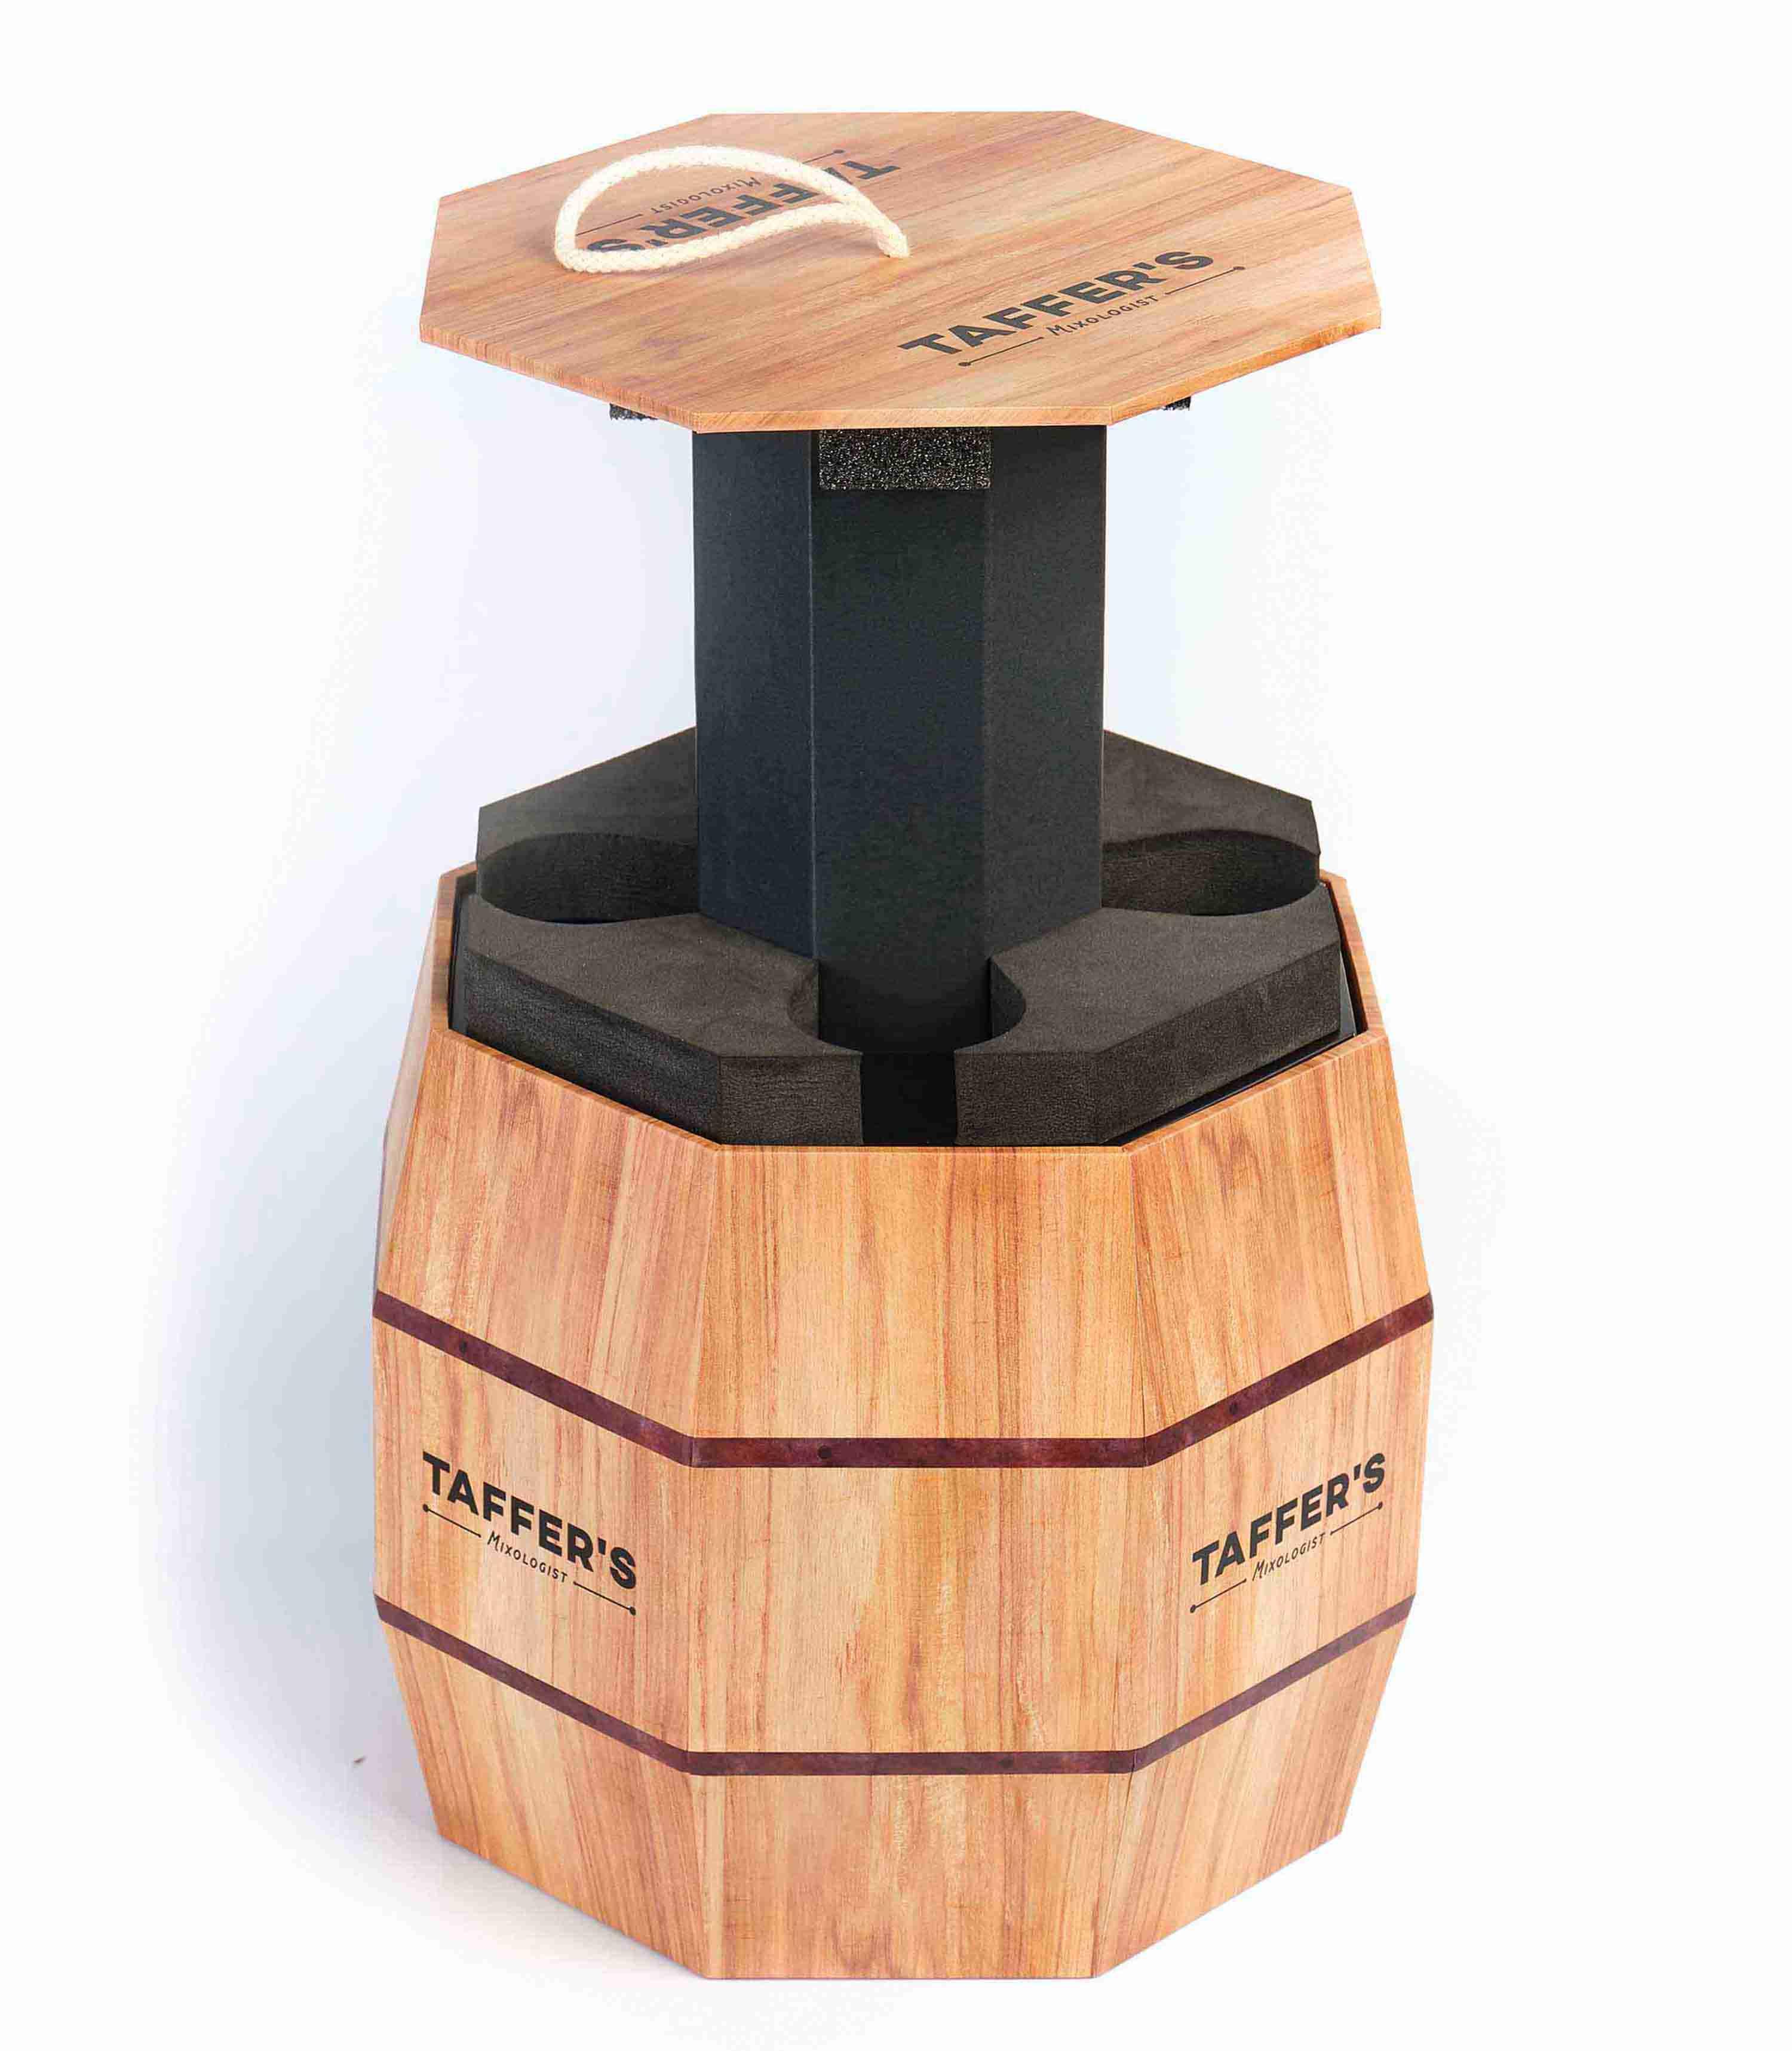 Taffer's Mixologist Box